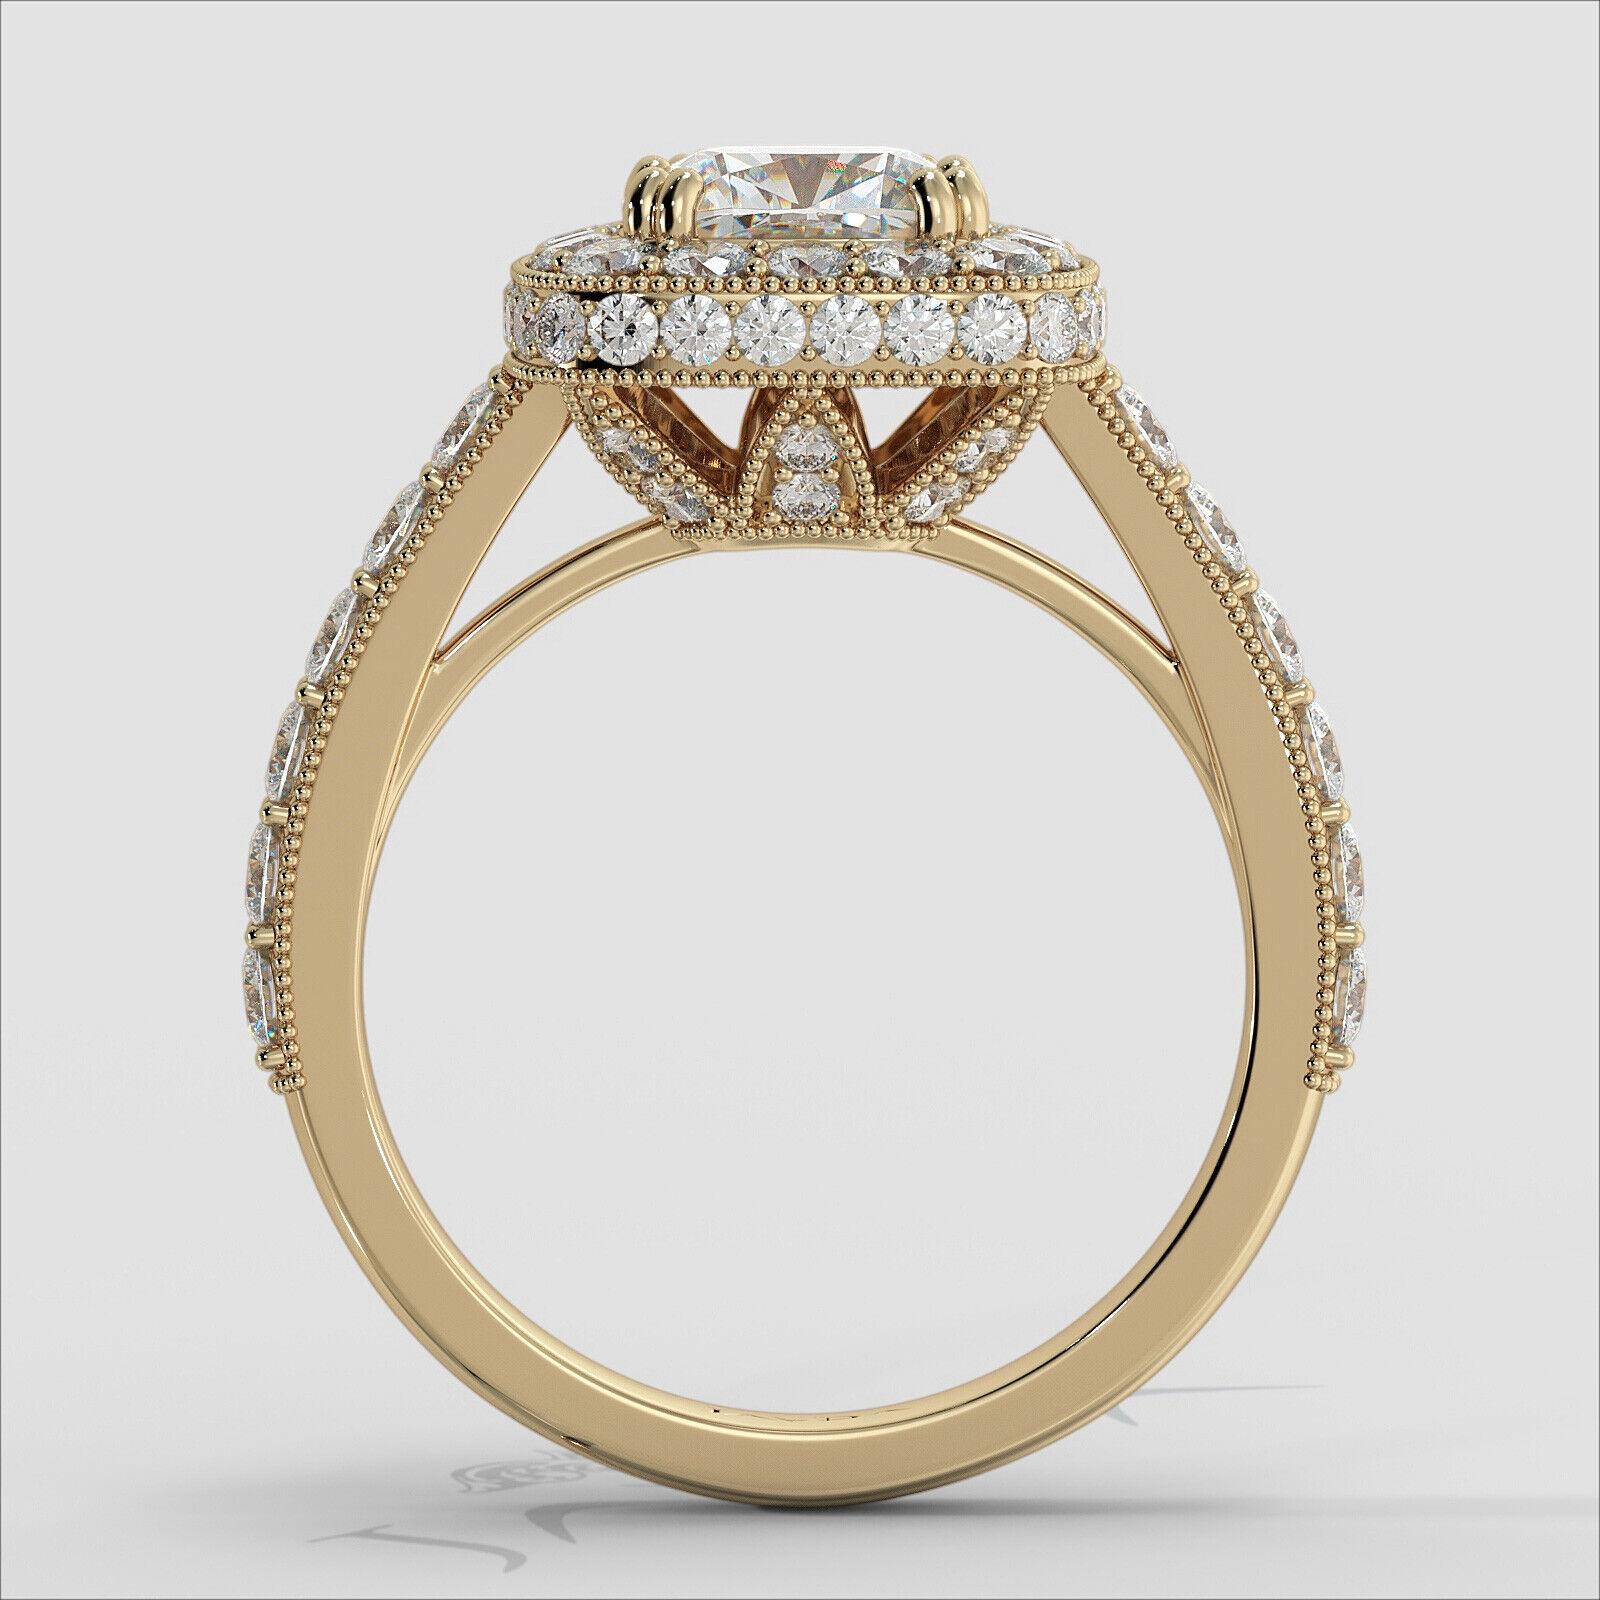 1.94ctw Milgrain Floral Basket Cushion Diamond Engagement Ring GIA E-VVS1 W Gold 10